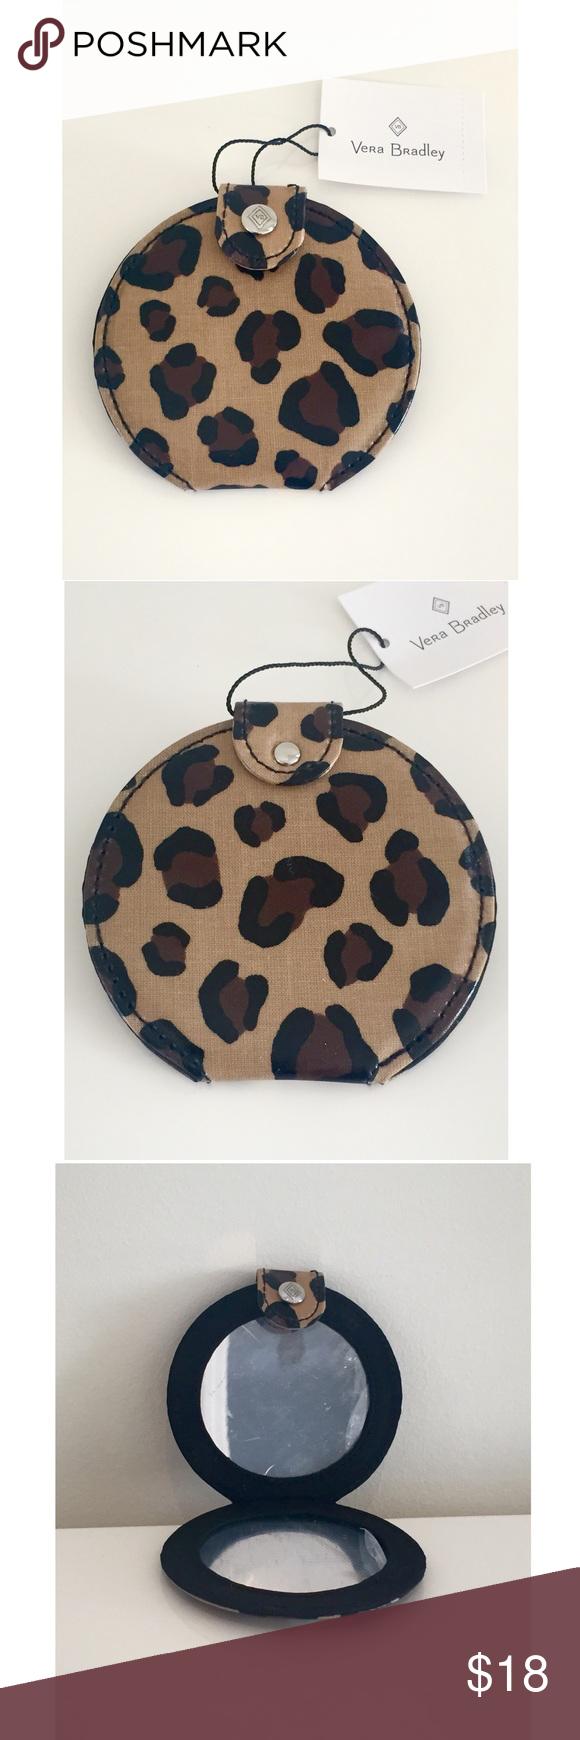 ac168166147 Nwt vera bradley leopard print pocket mirror bag vera bradley pocket mirror  in leopard png 580x1740